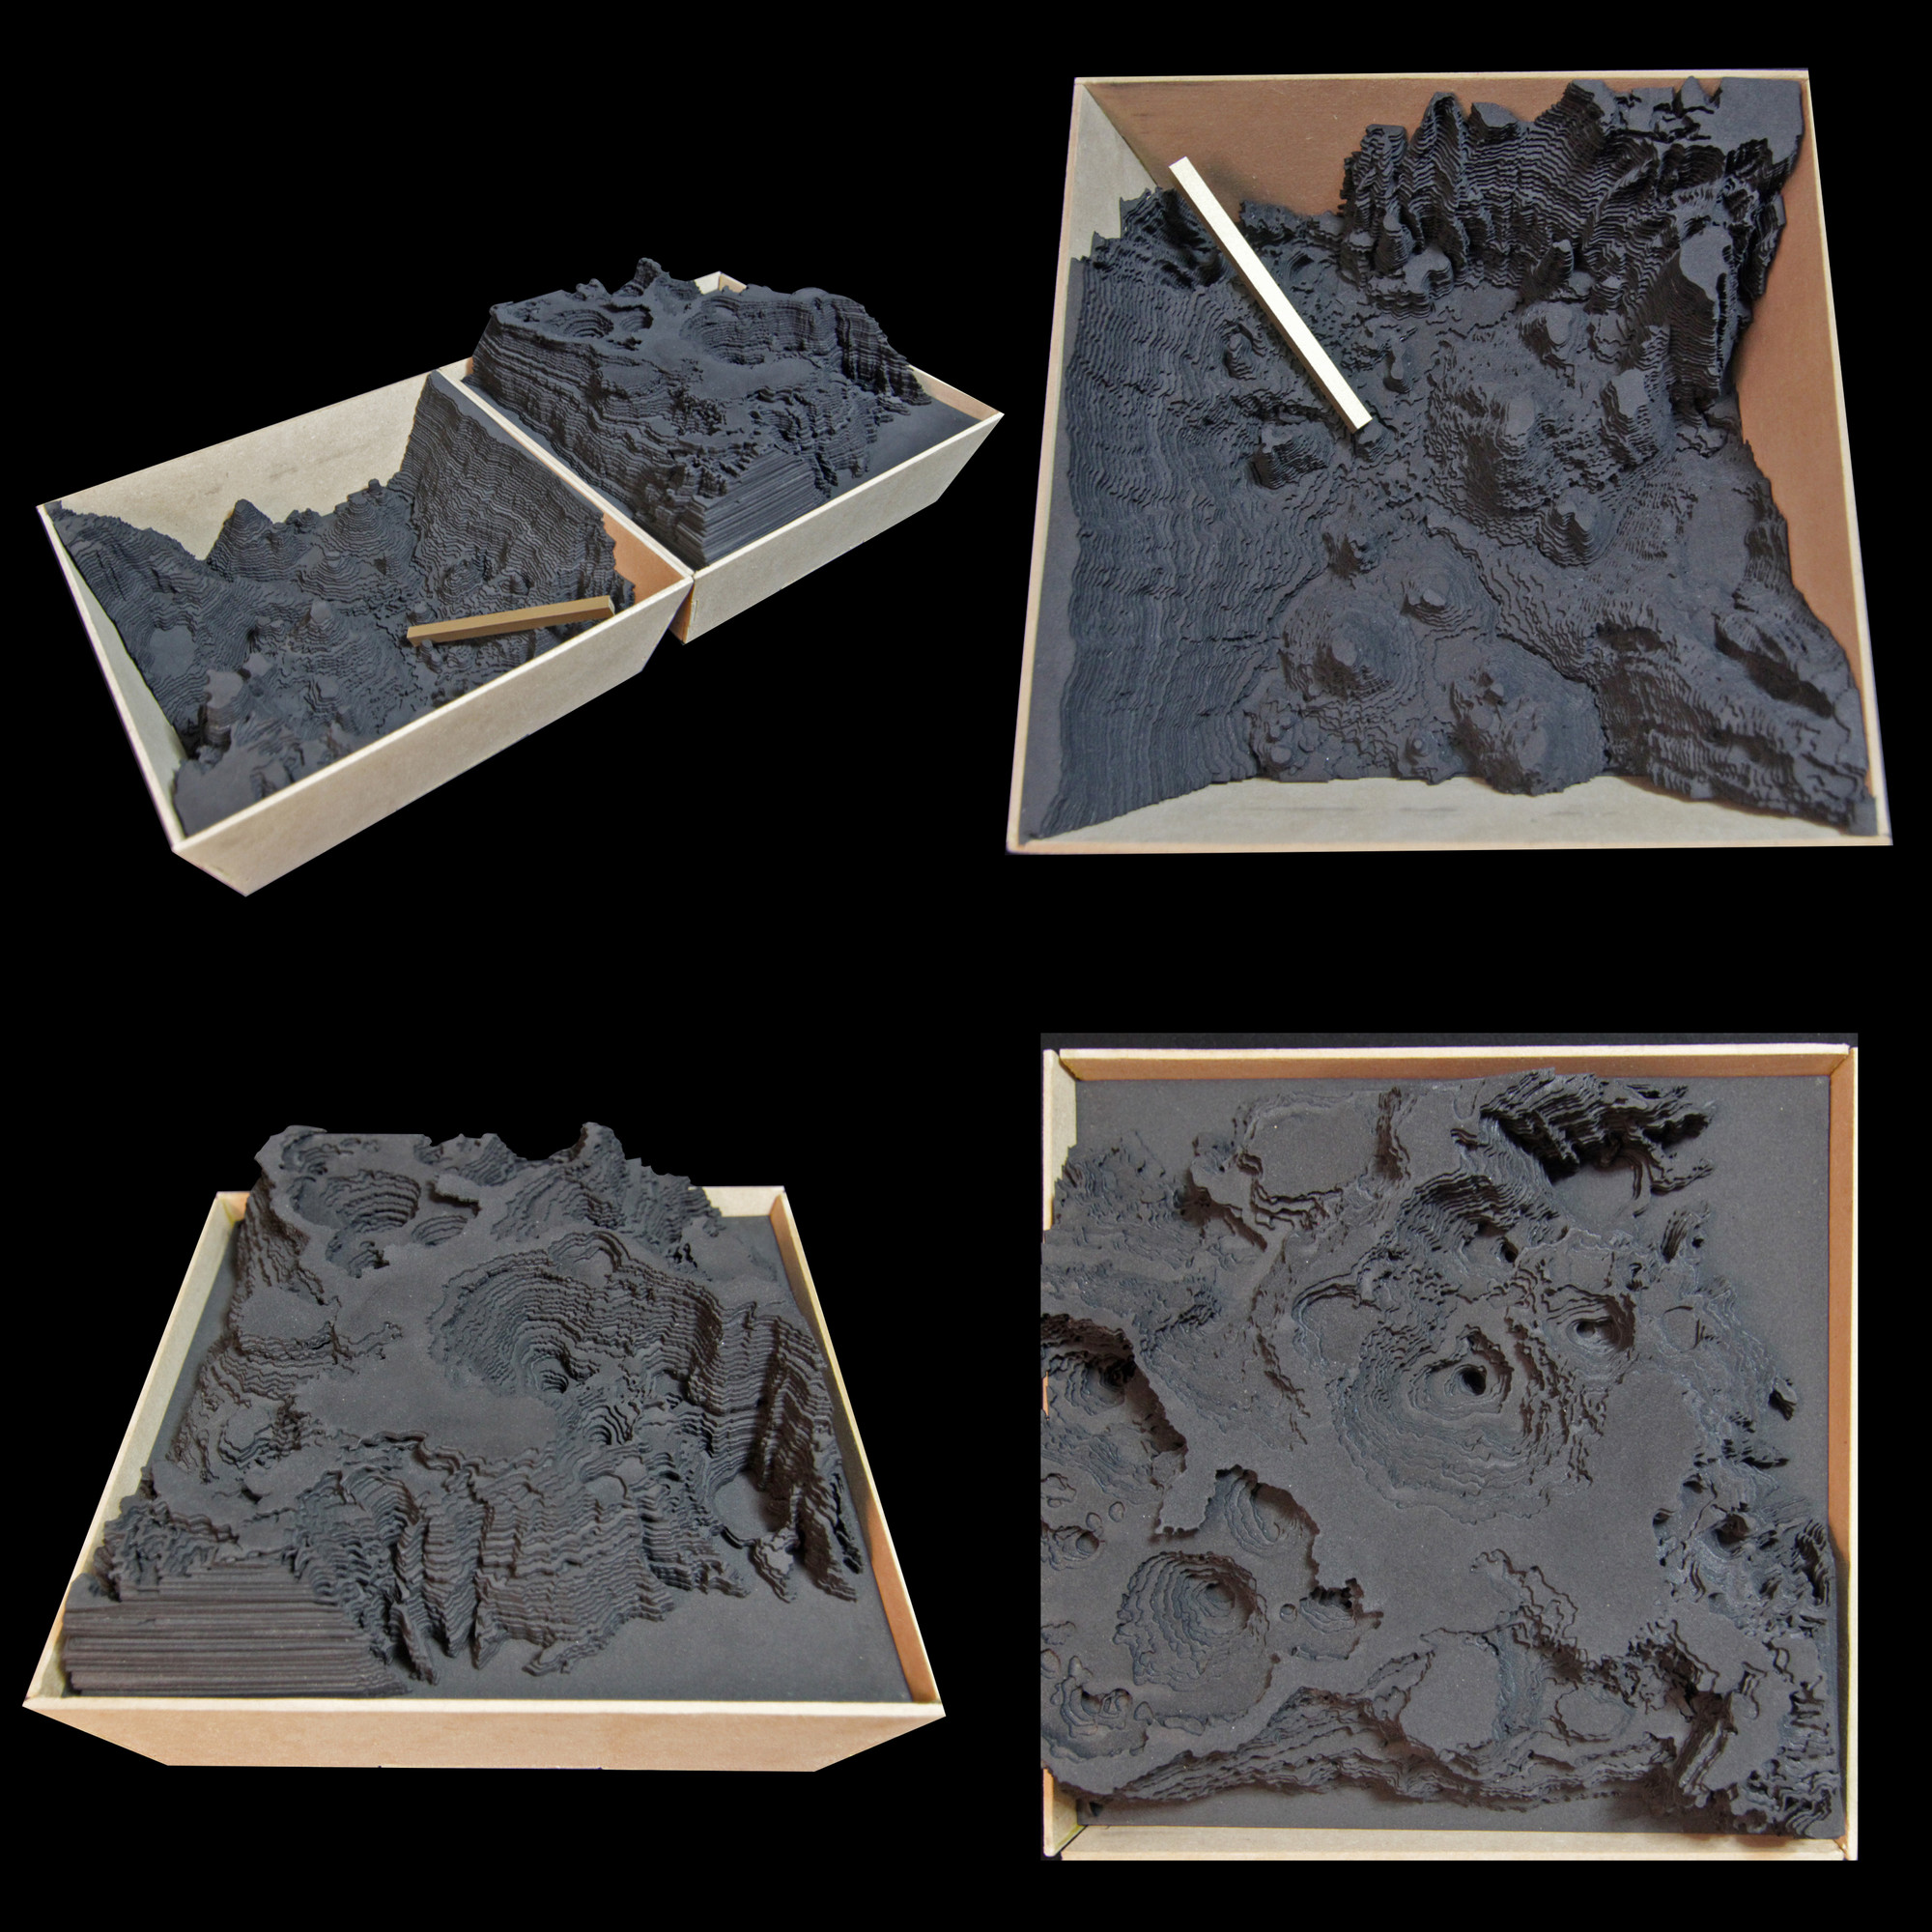 Pieza-Caja de Taller Veinticuatro